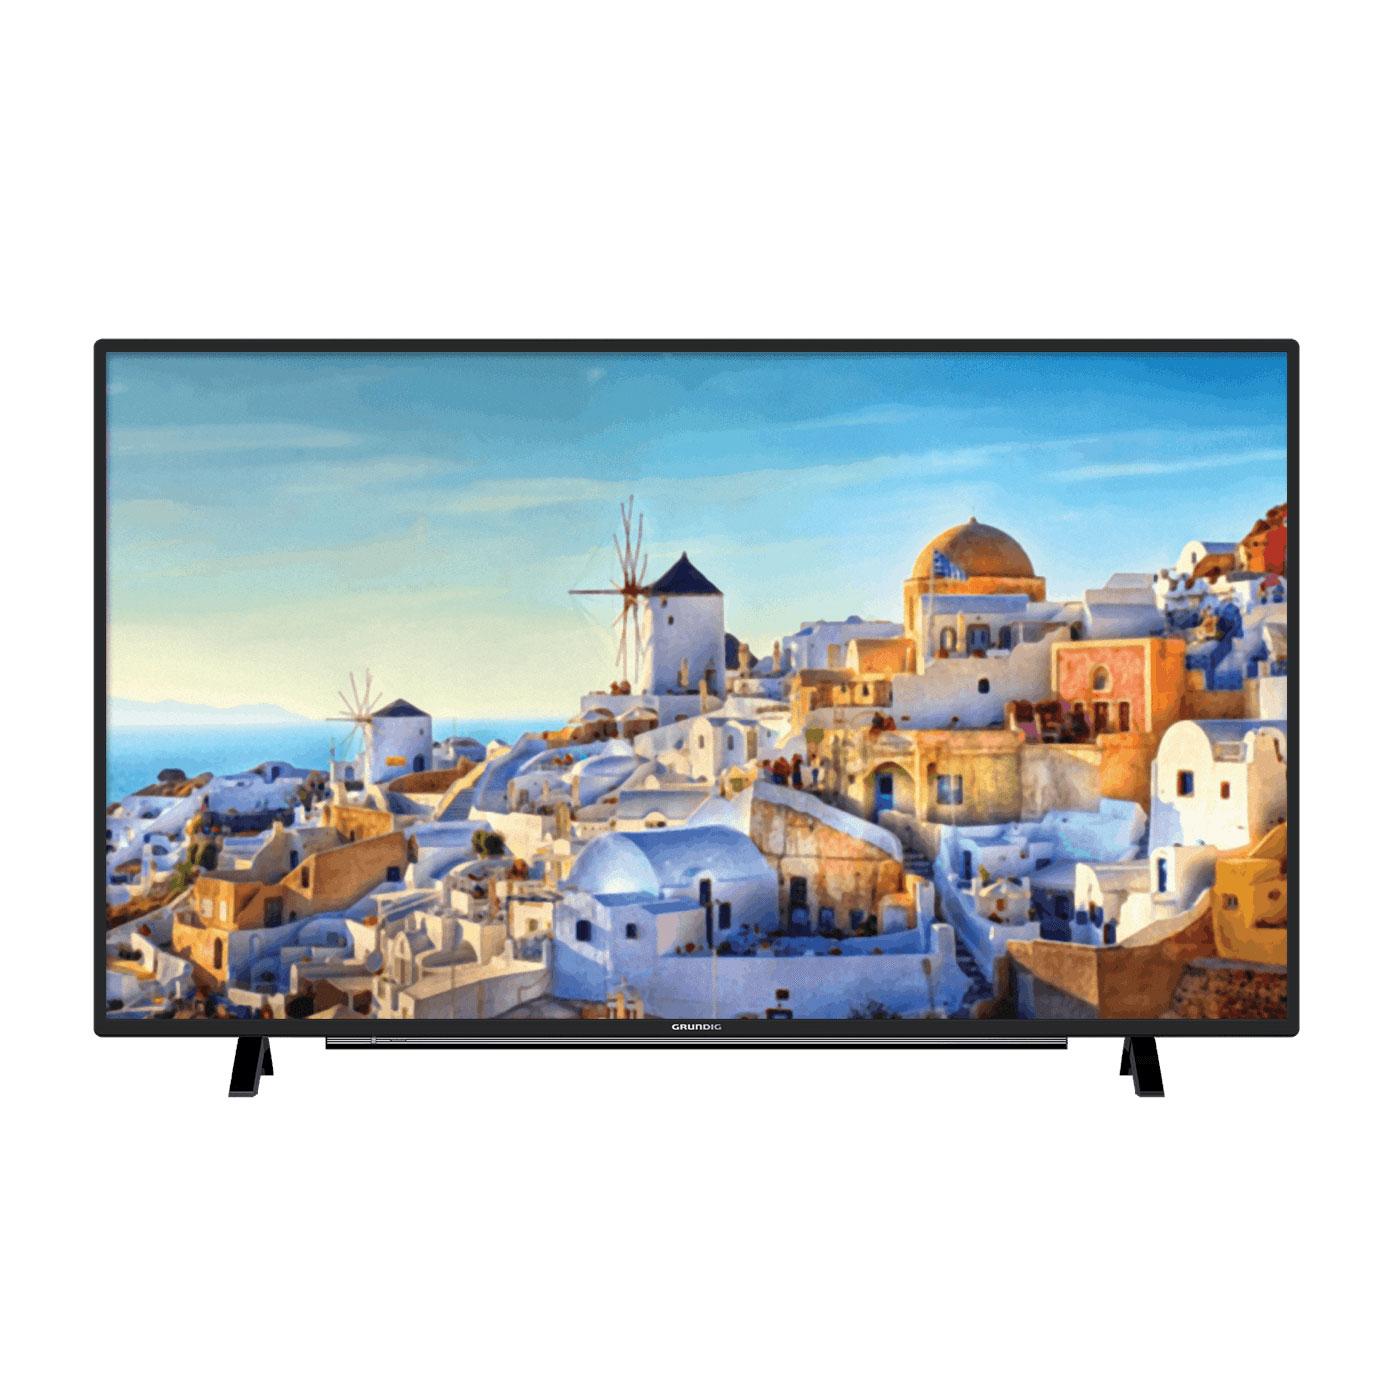 "TV Grundig 32VLE6730BP Téléviseur LED Full HD 32"" (81 cm) 16/9 - 1920 x 1080 pixels - HDTV 1080p - Wi-Fi - Bluetooth - DLNA - 800 Hz - Haut-parleurs en façade"